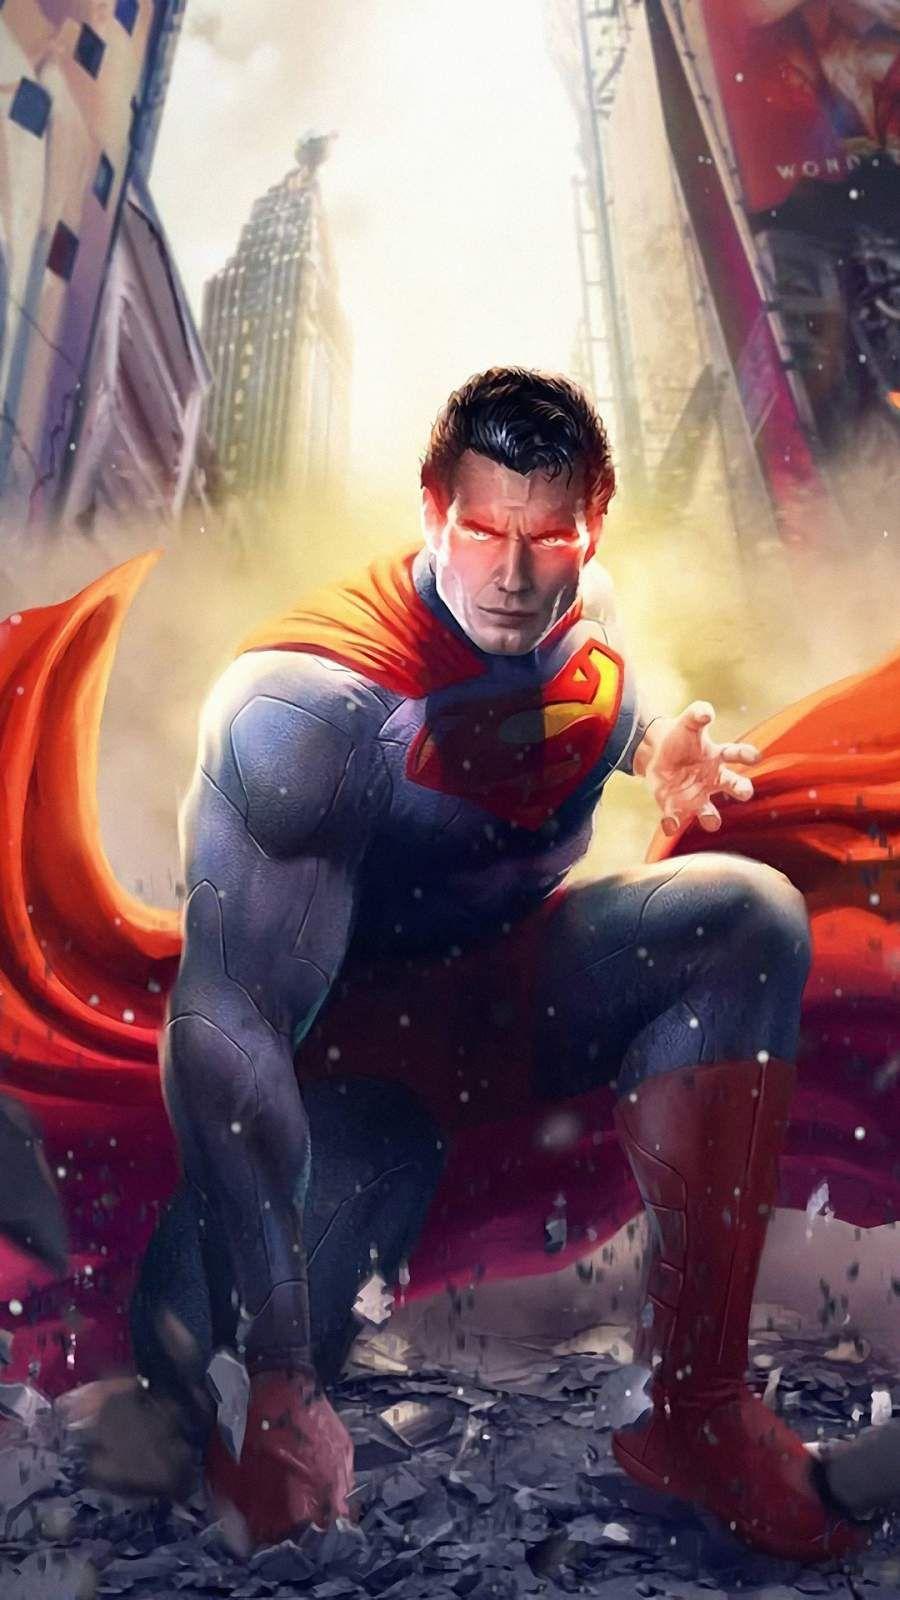 Henry Cavill Superman Iphone Wallpaper Superman Wallpaper Superman Art Superhero Wallpaper